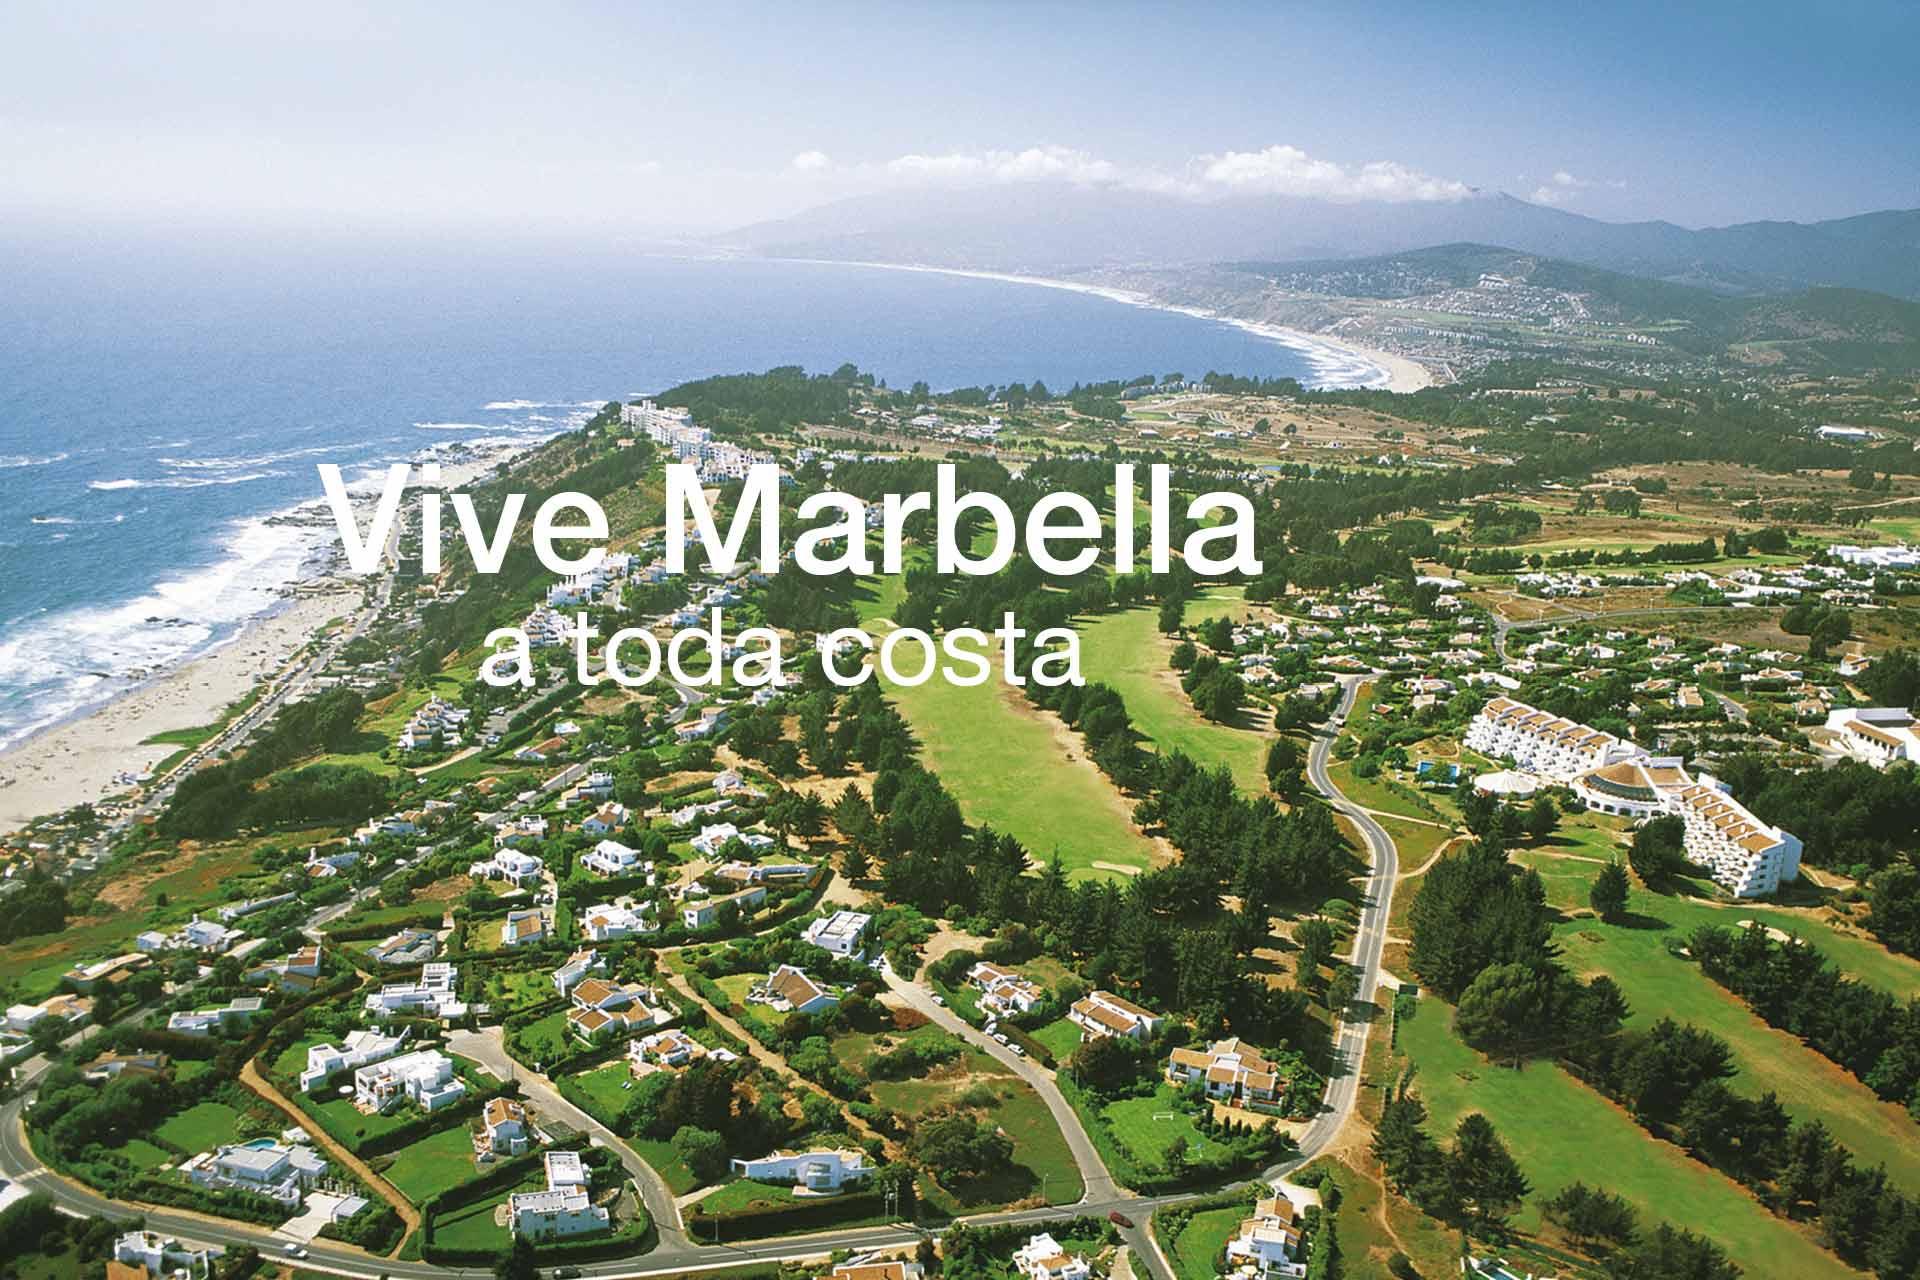 Hotel_Marbella_Resort_a_toda_costa